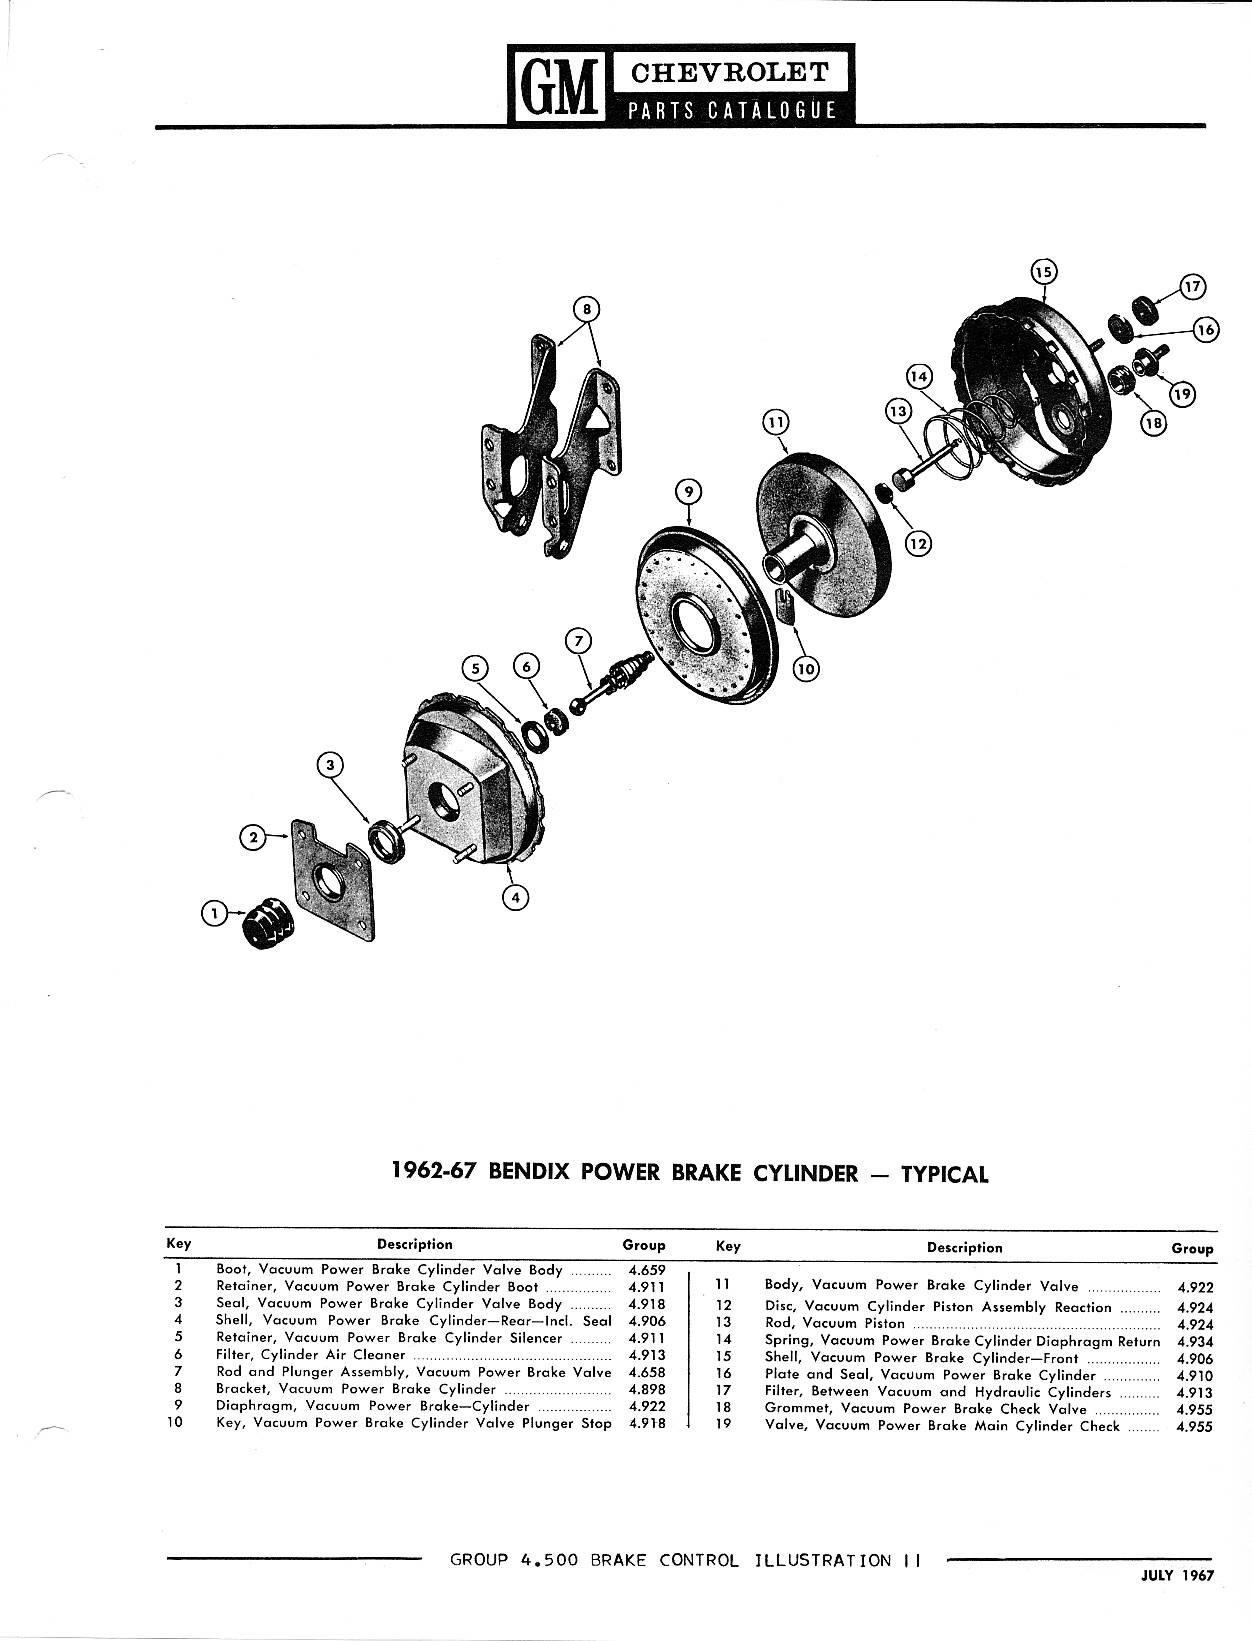 1958-1968 Chevrolet Parts Catalog / Image13.jpg